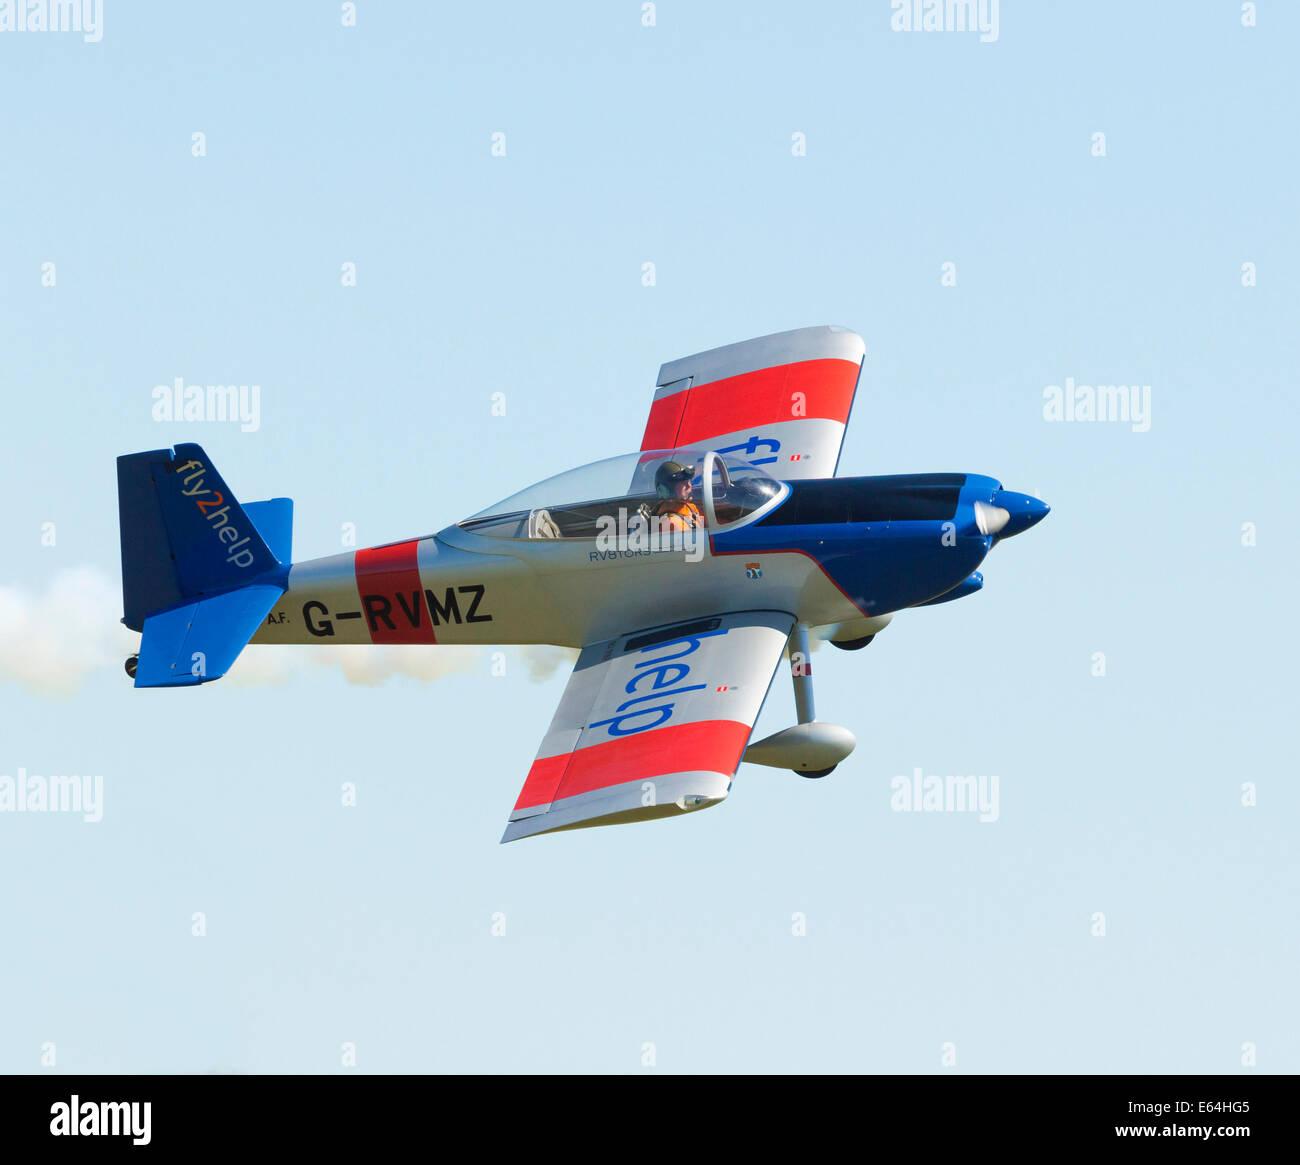 VANS RV-8 aircraft in aerobatic display in the UK - Stock Image